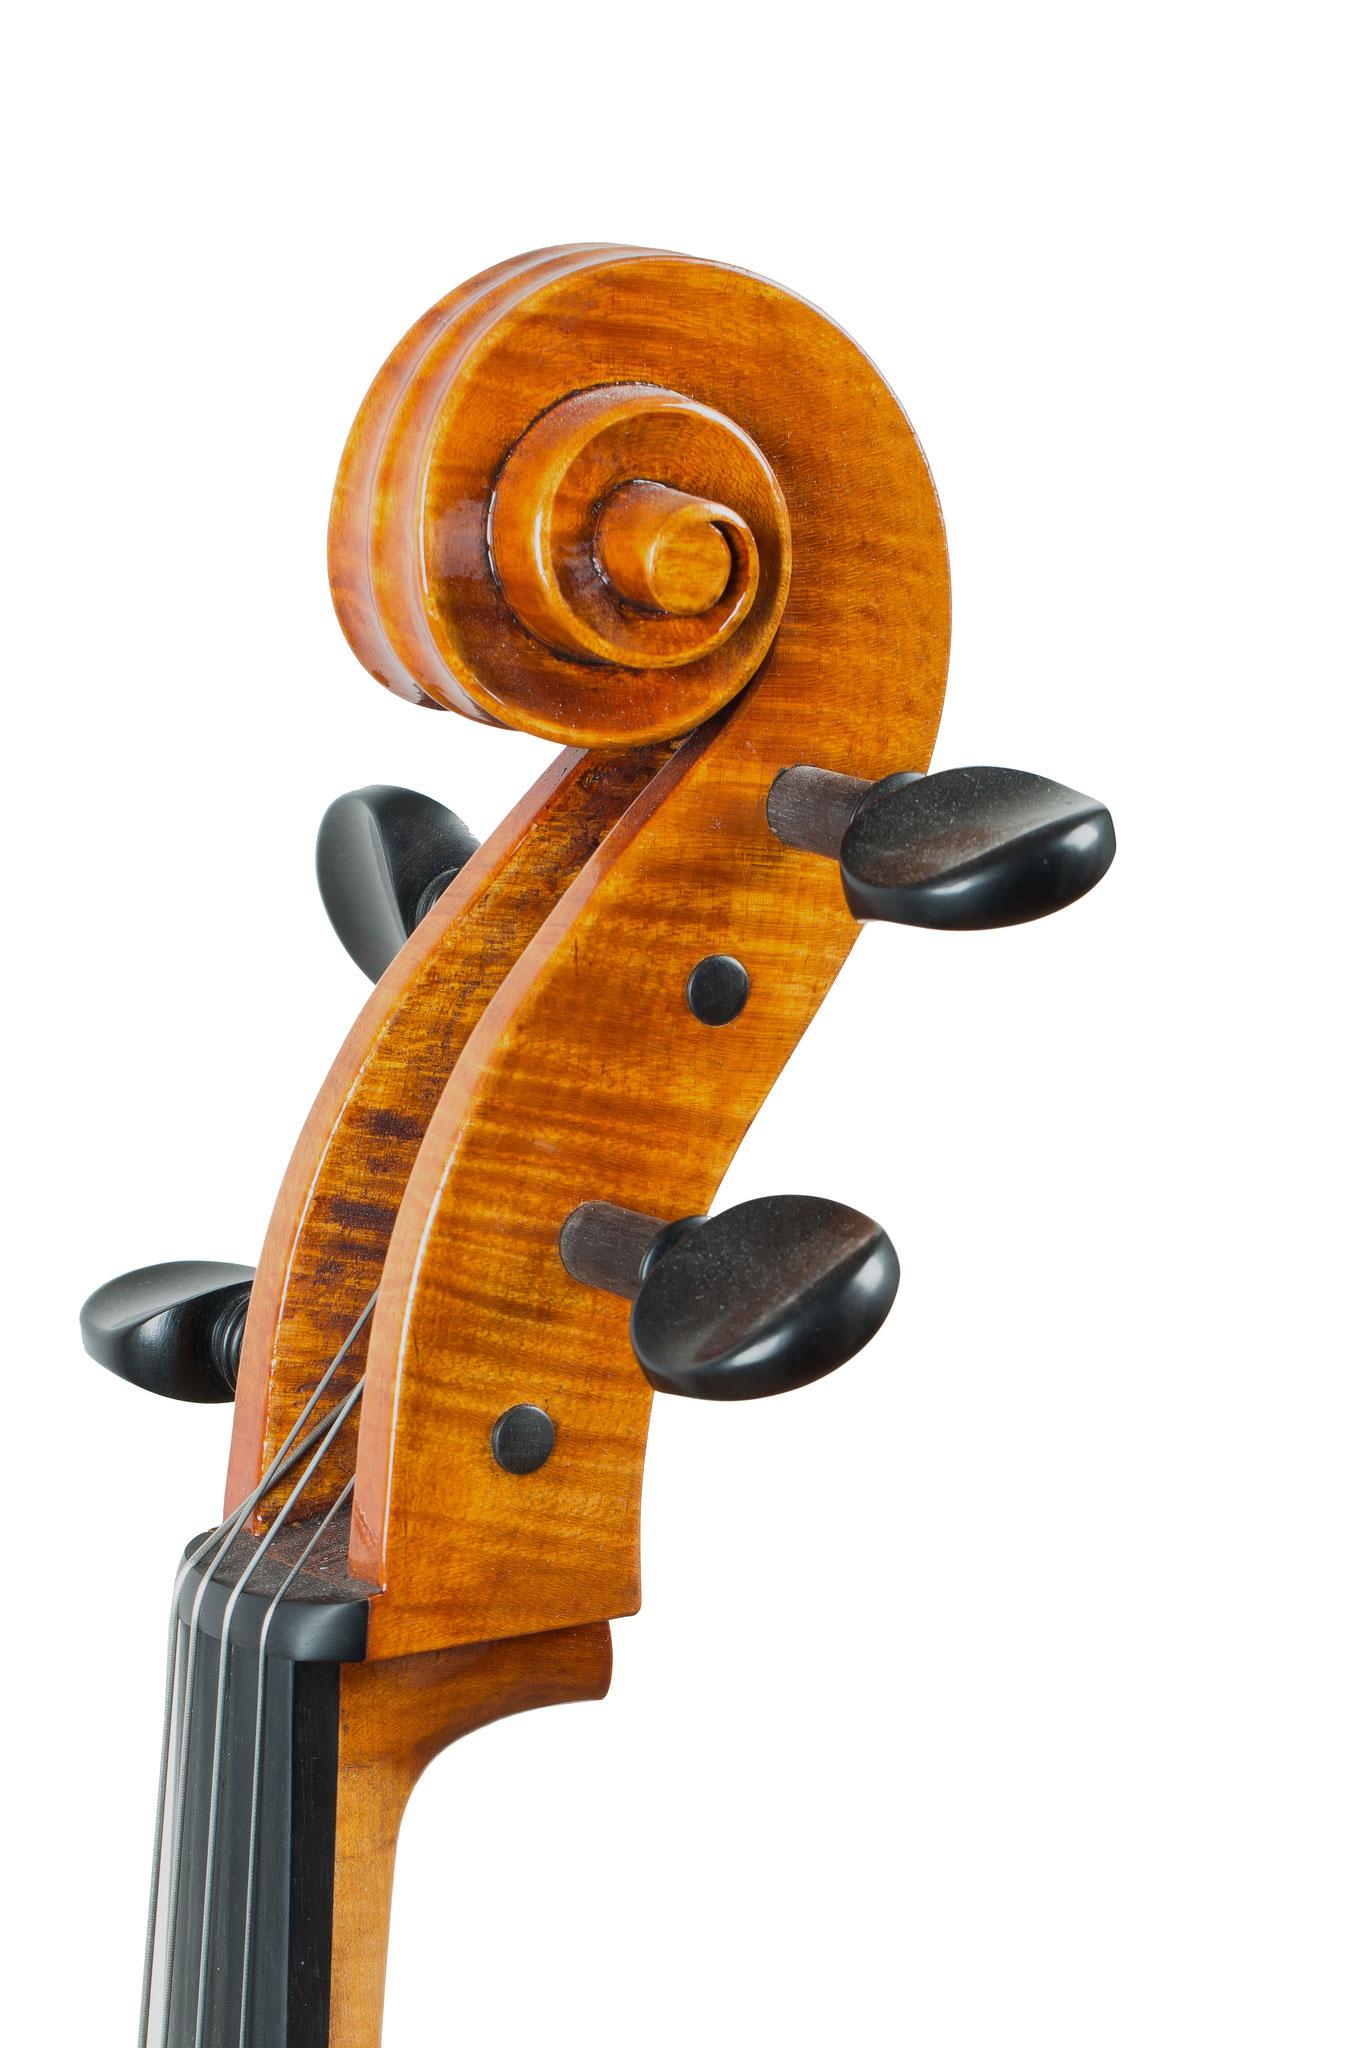 "7/8 Cello nach G.B. Guadagnini 1757 ""Teschenmacher"" (2015/CH), Photo: VDB Photography"